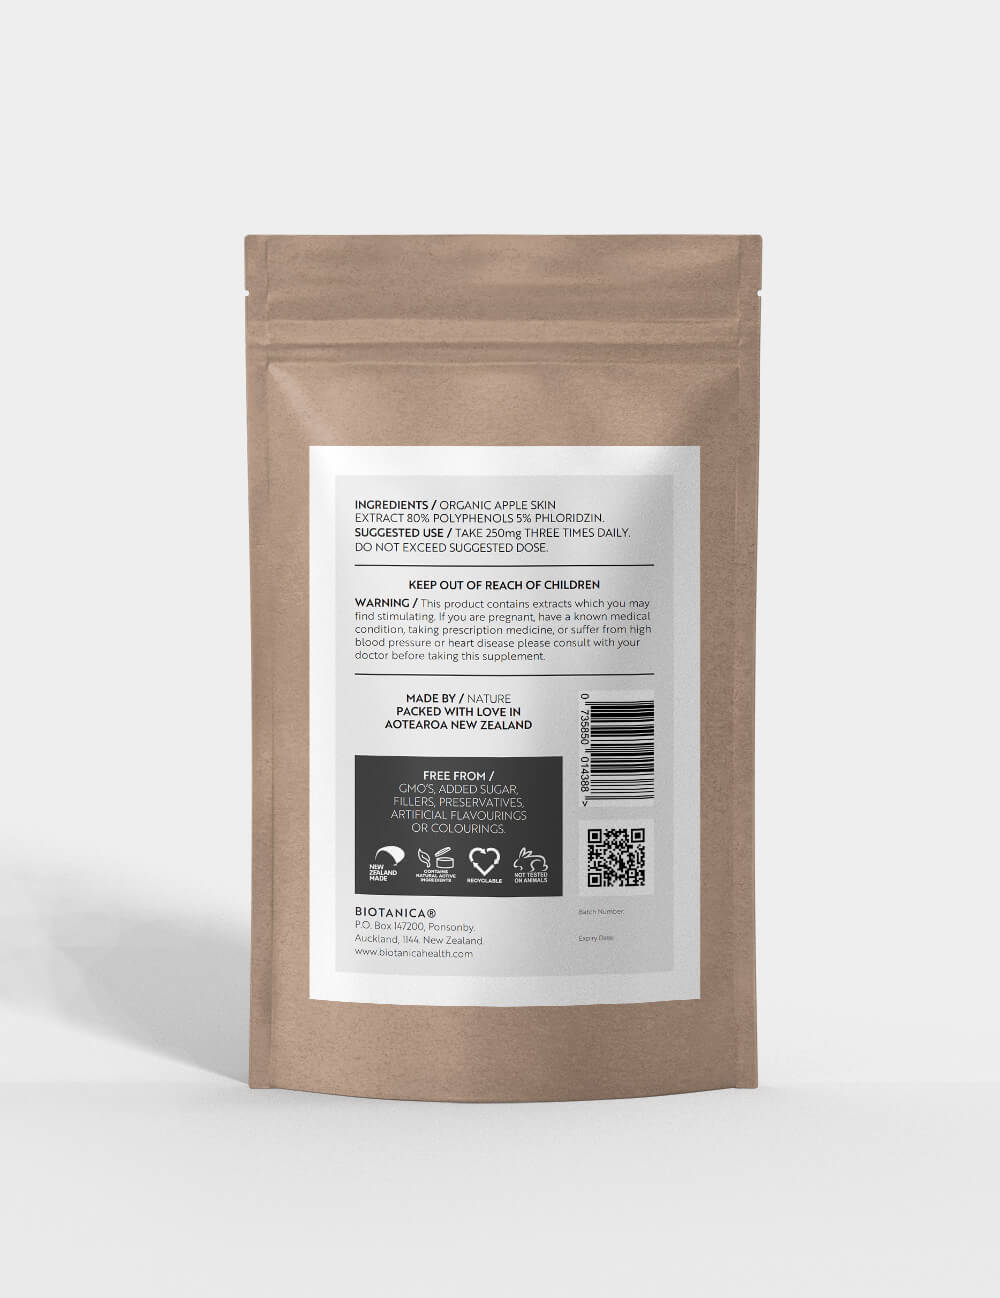 Apple Skin Polyphenol Image 2